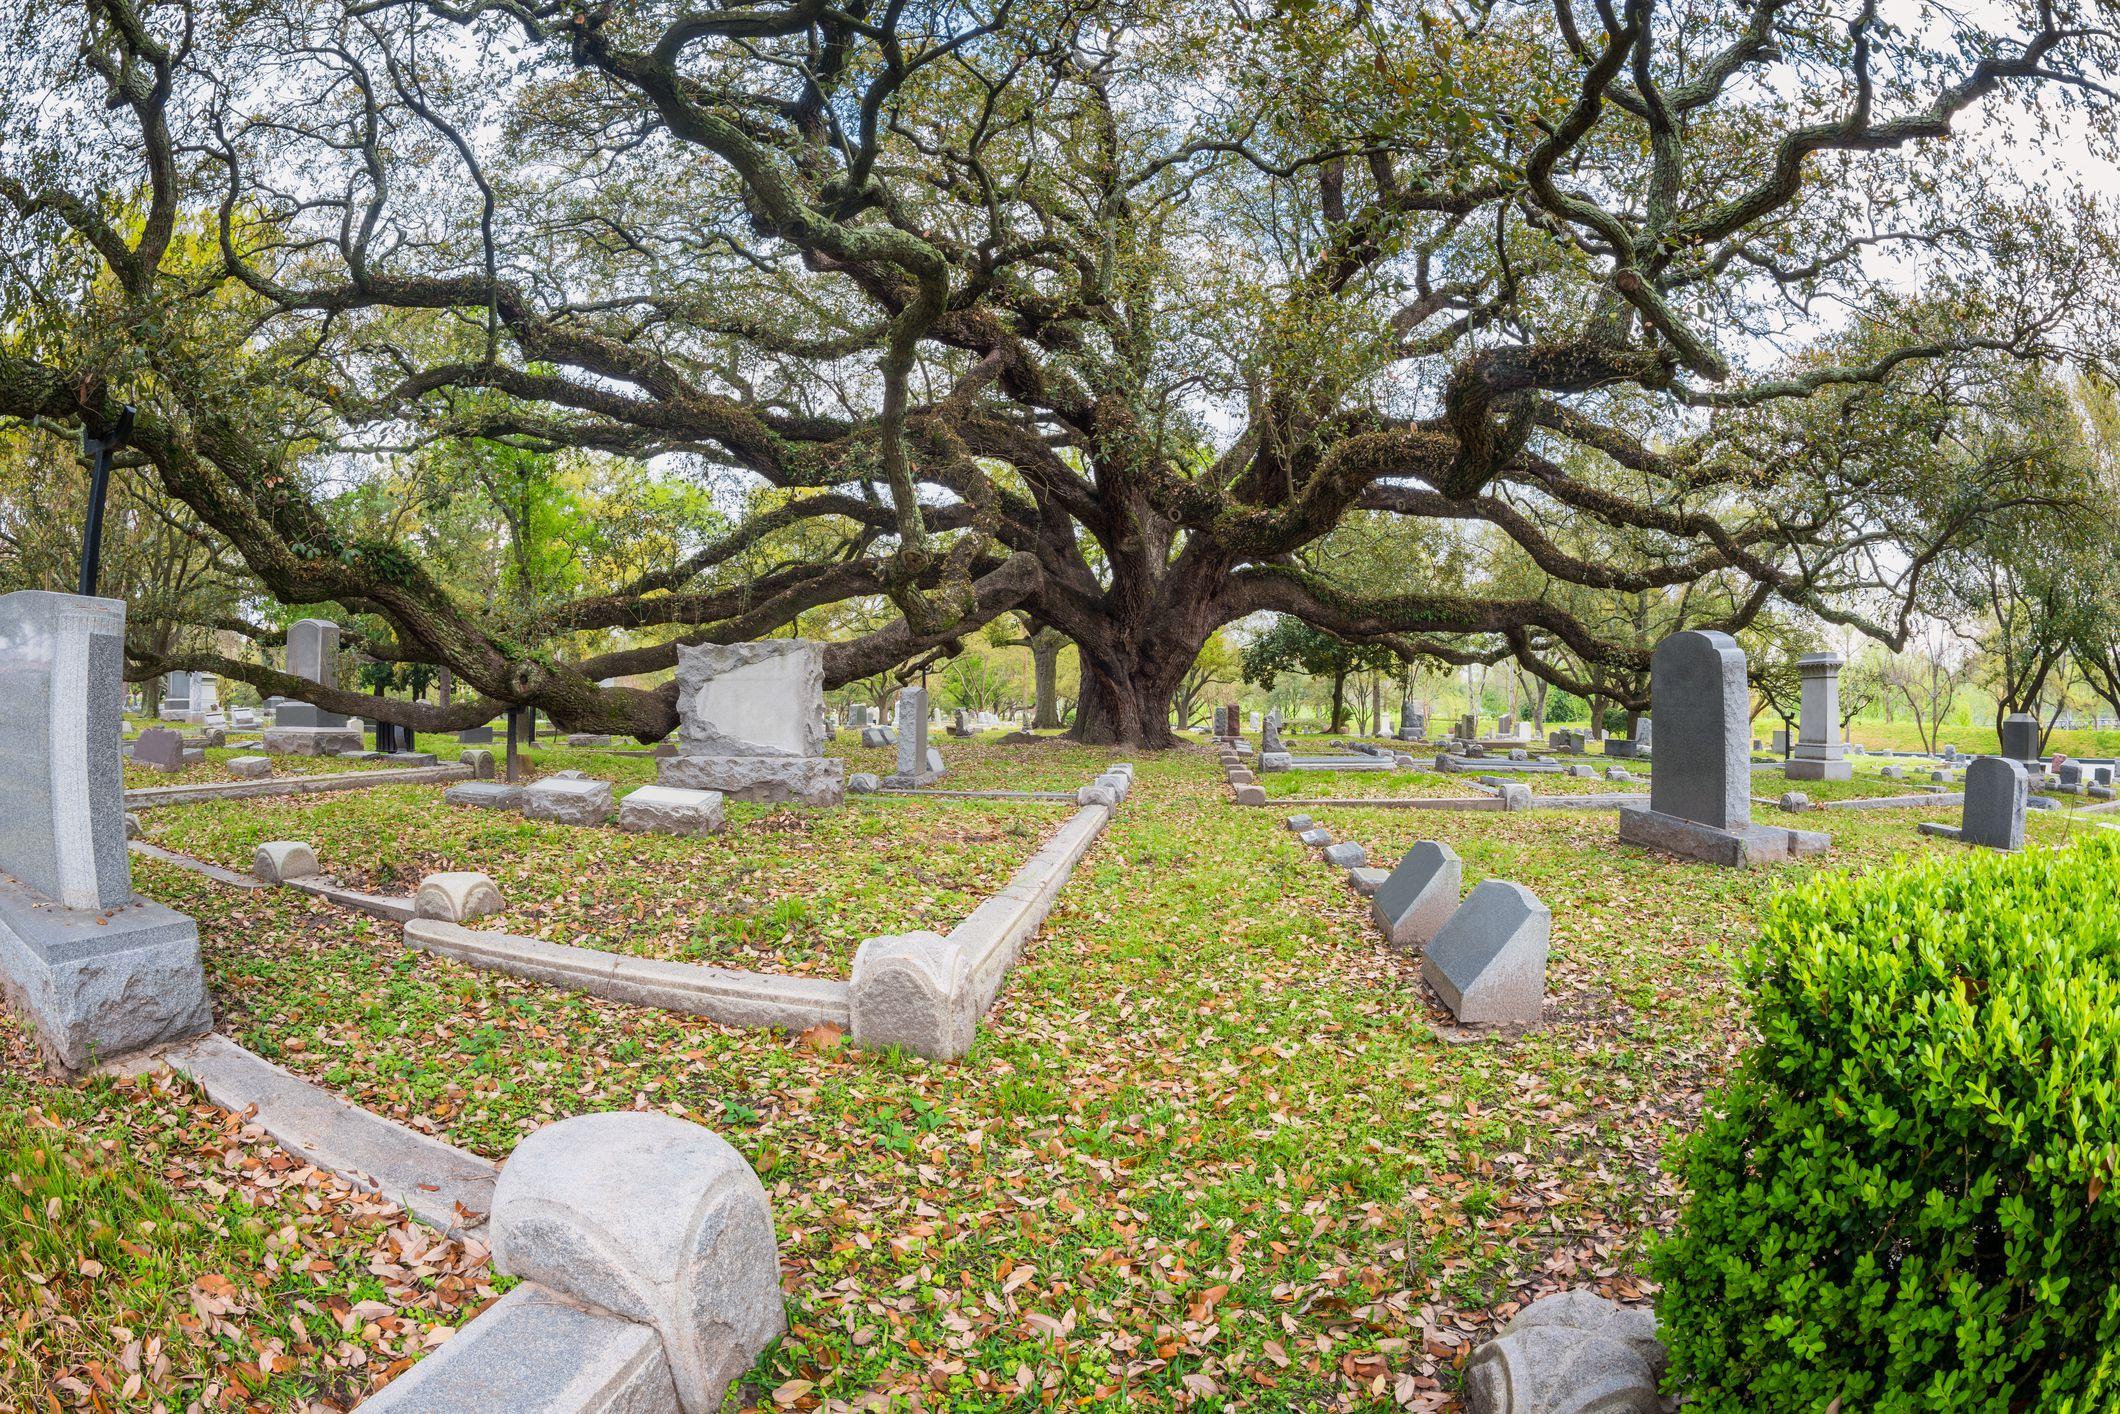 Giant Live Oak on Cemetery in Houston,Texas